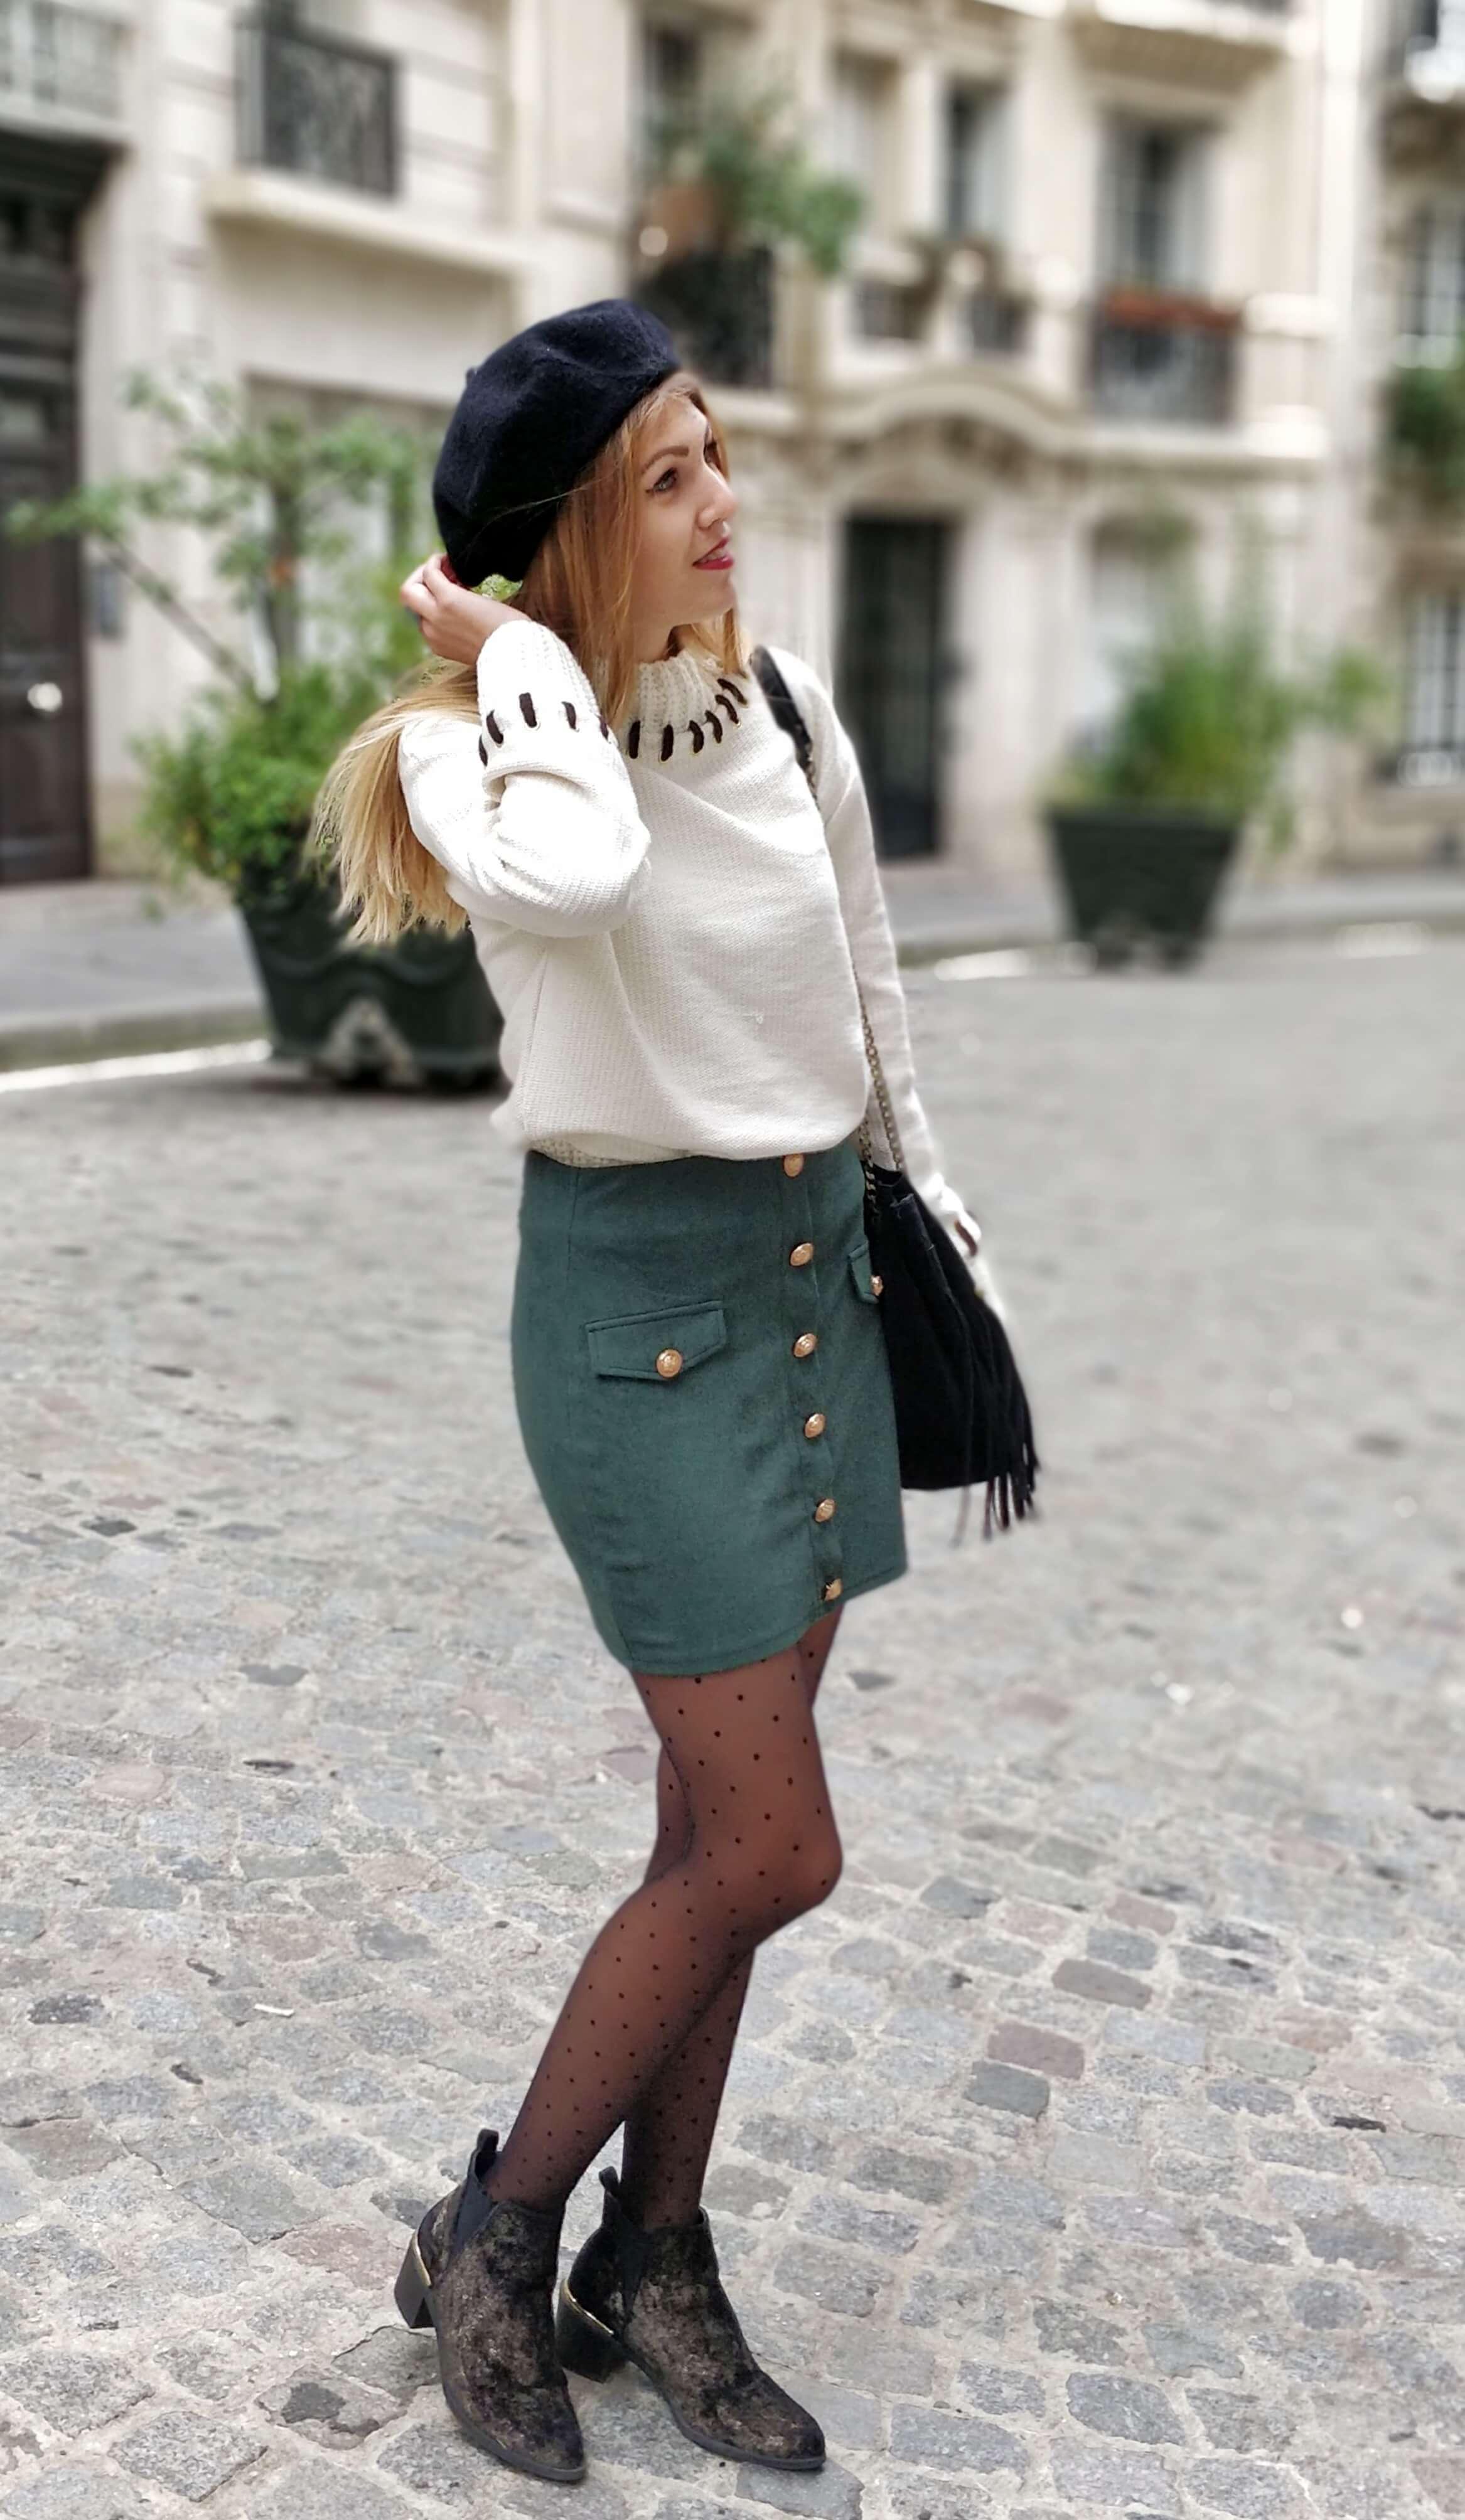 jupe sapin tenue hiver blog mode - La couleur de l'hiver